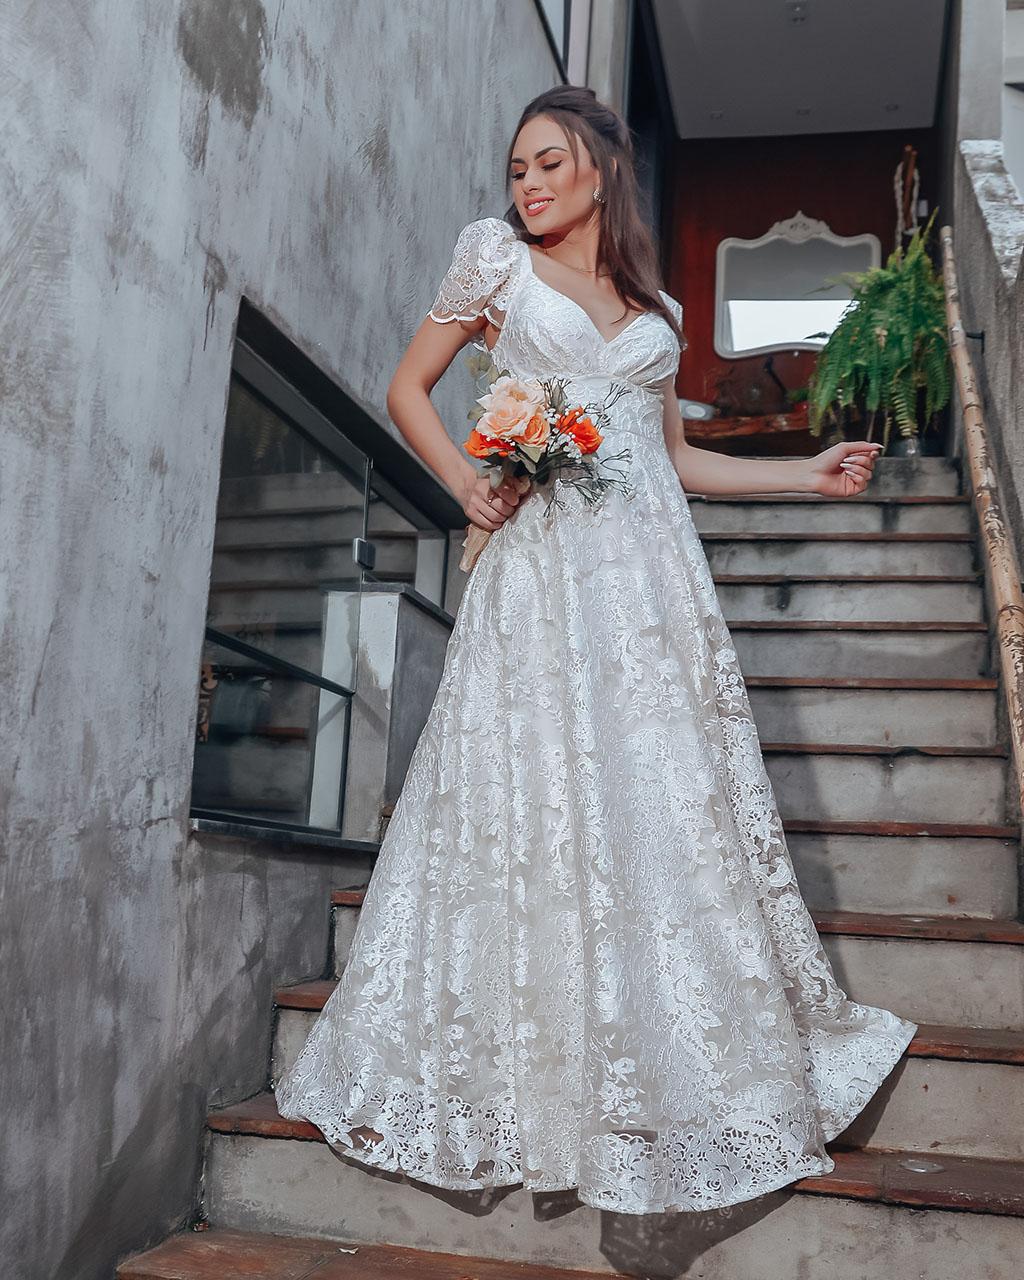 Vestido Açucena  - Empório NM